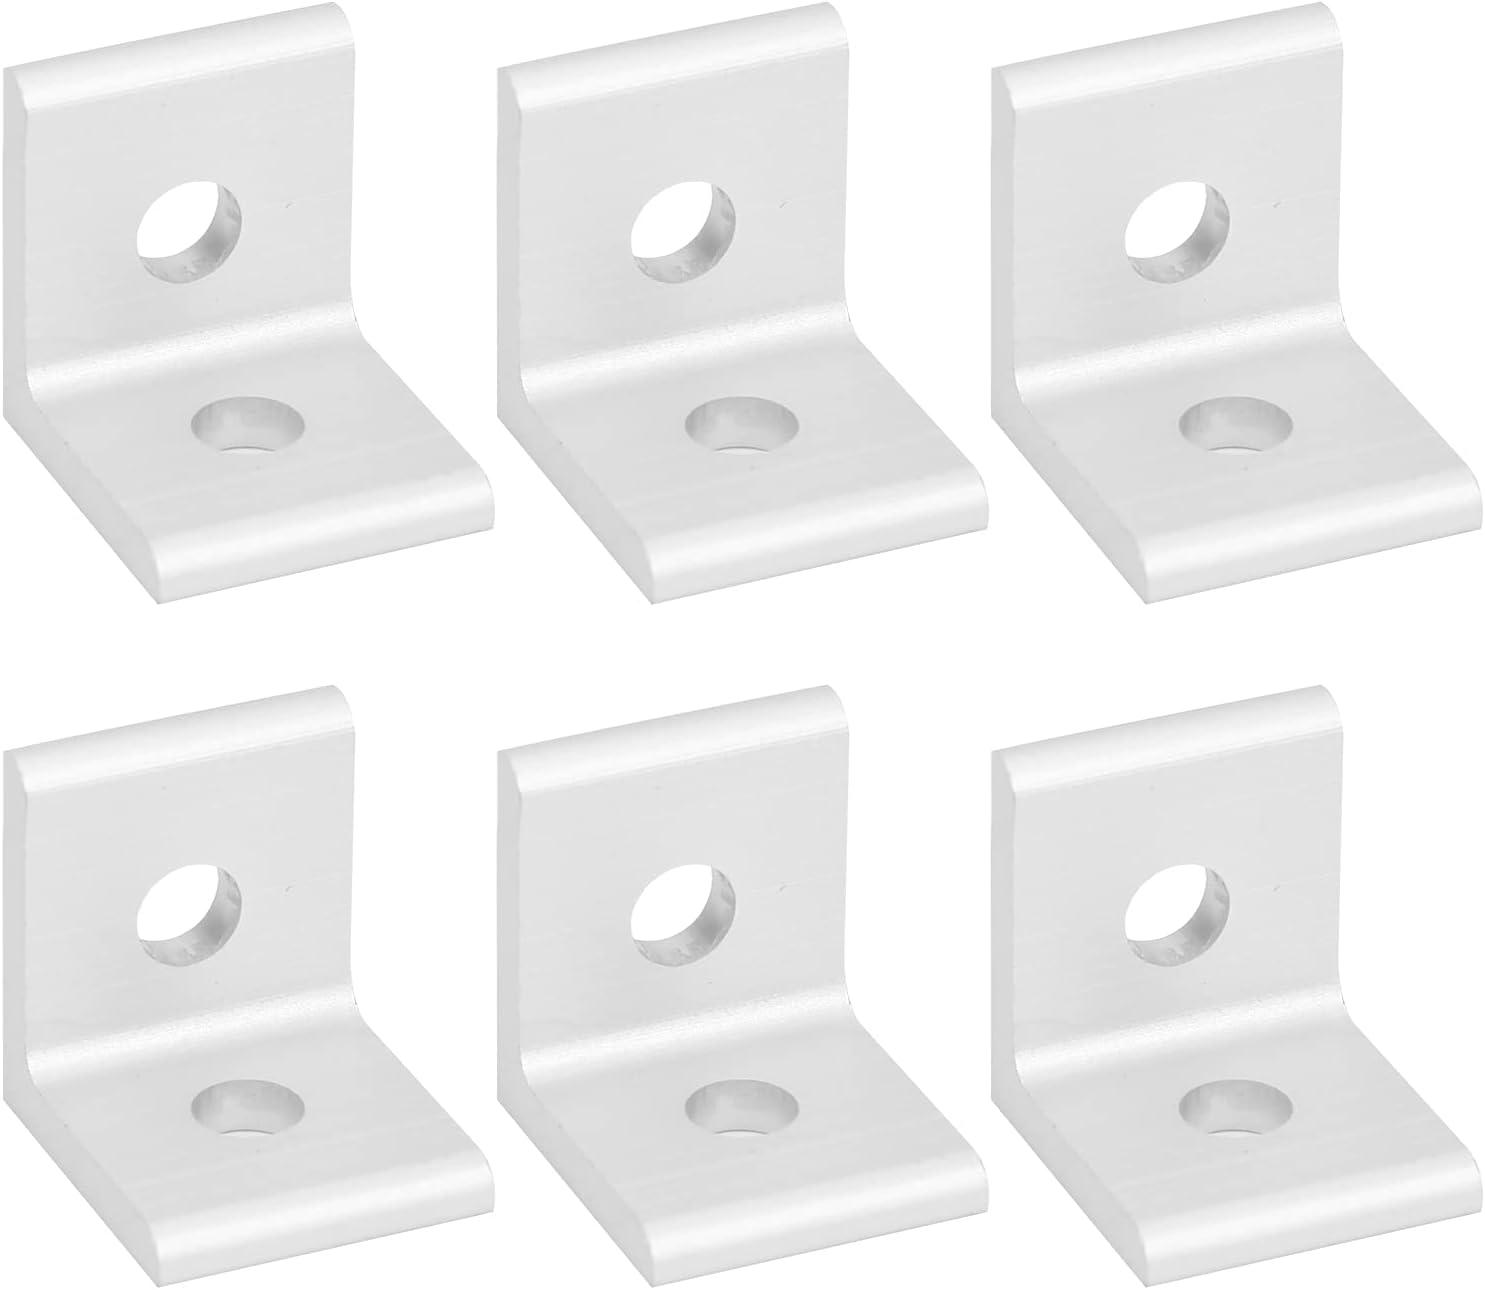 YIUS 10pcs L Bracket Corner Shape Joi Connector Aluminum Brace At the price Overseas parallel import regular item